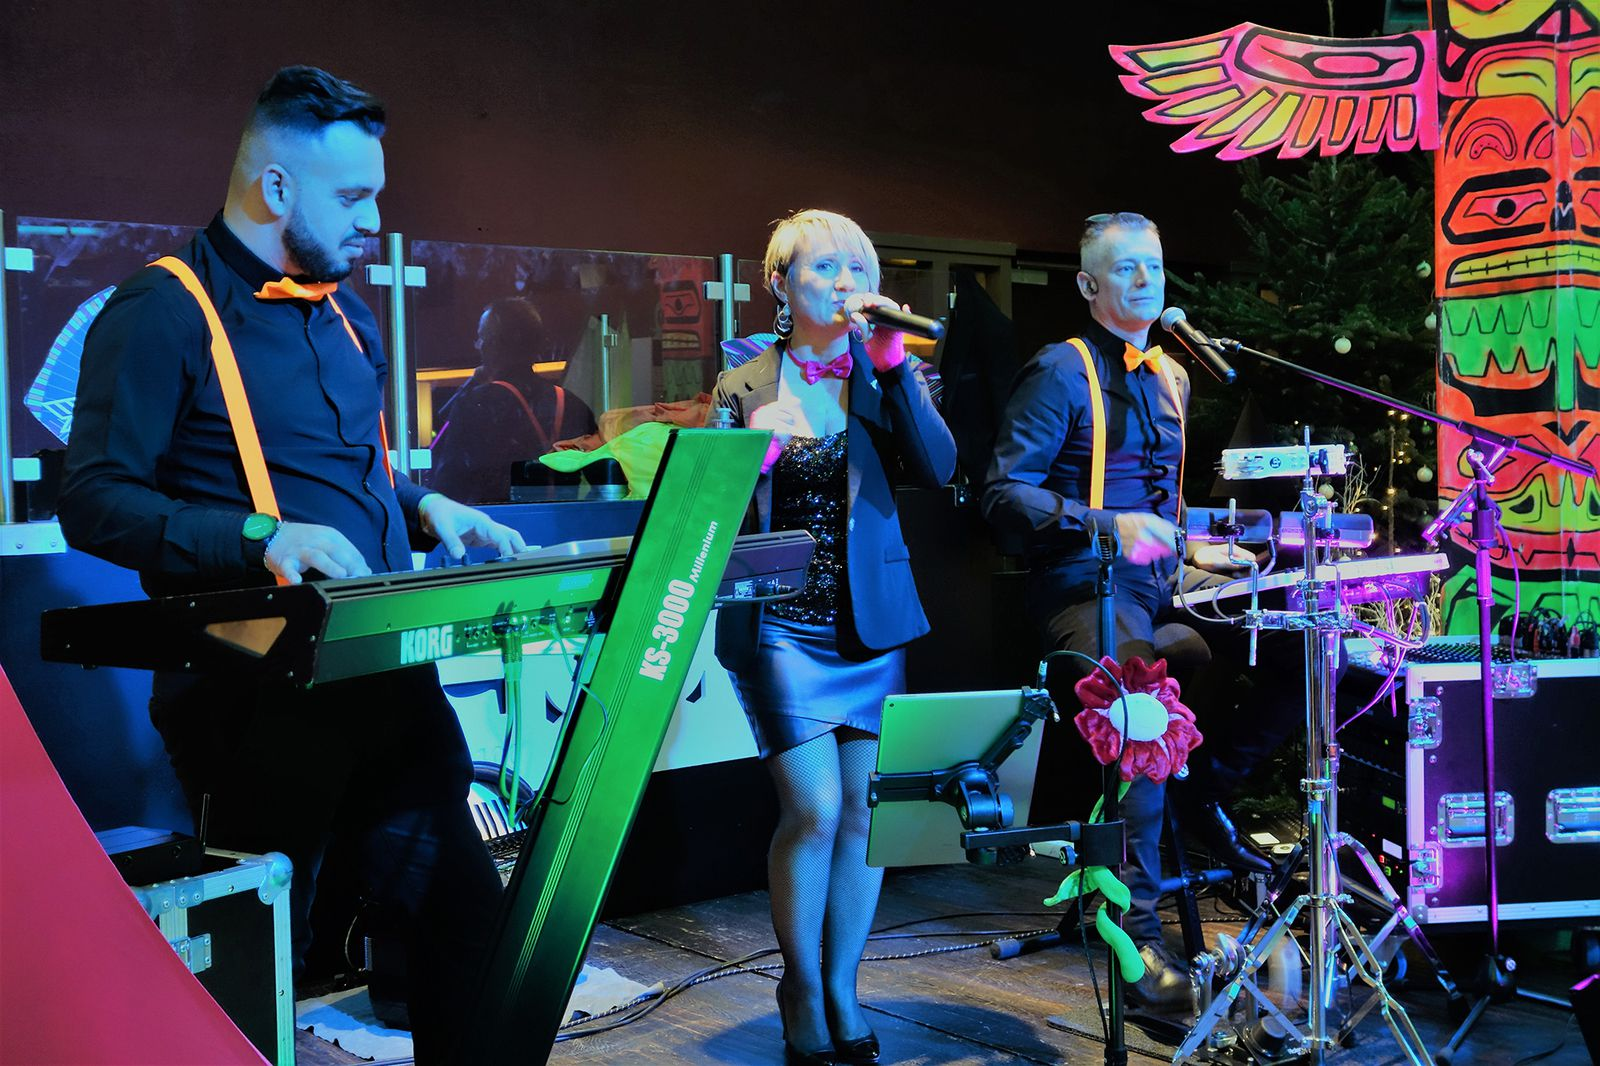 Groupe de musique Avignon